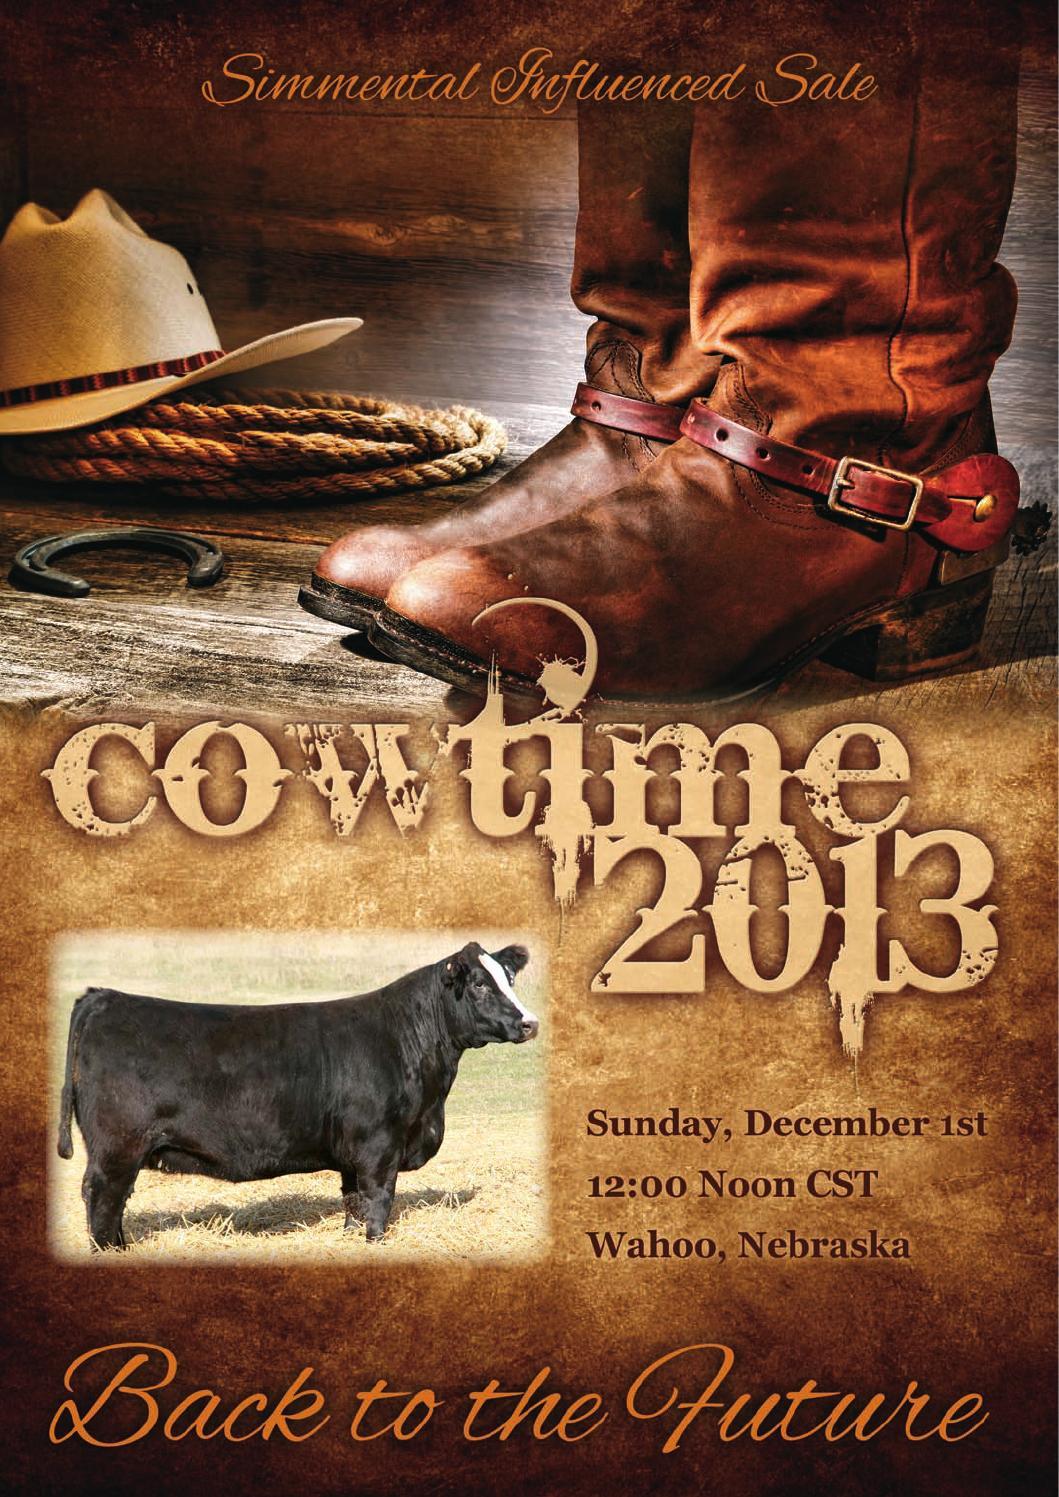 Cowtime Sale Catalog 2013 By Eberspacher Enterprises Issuu